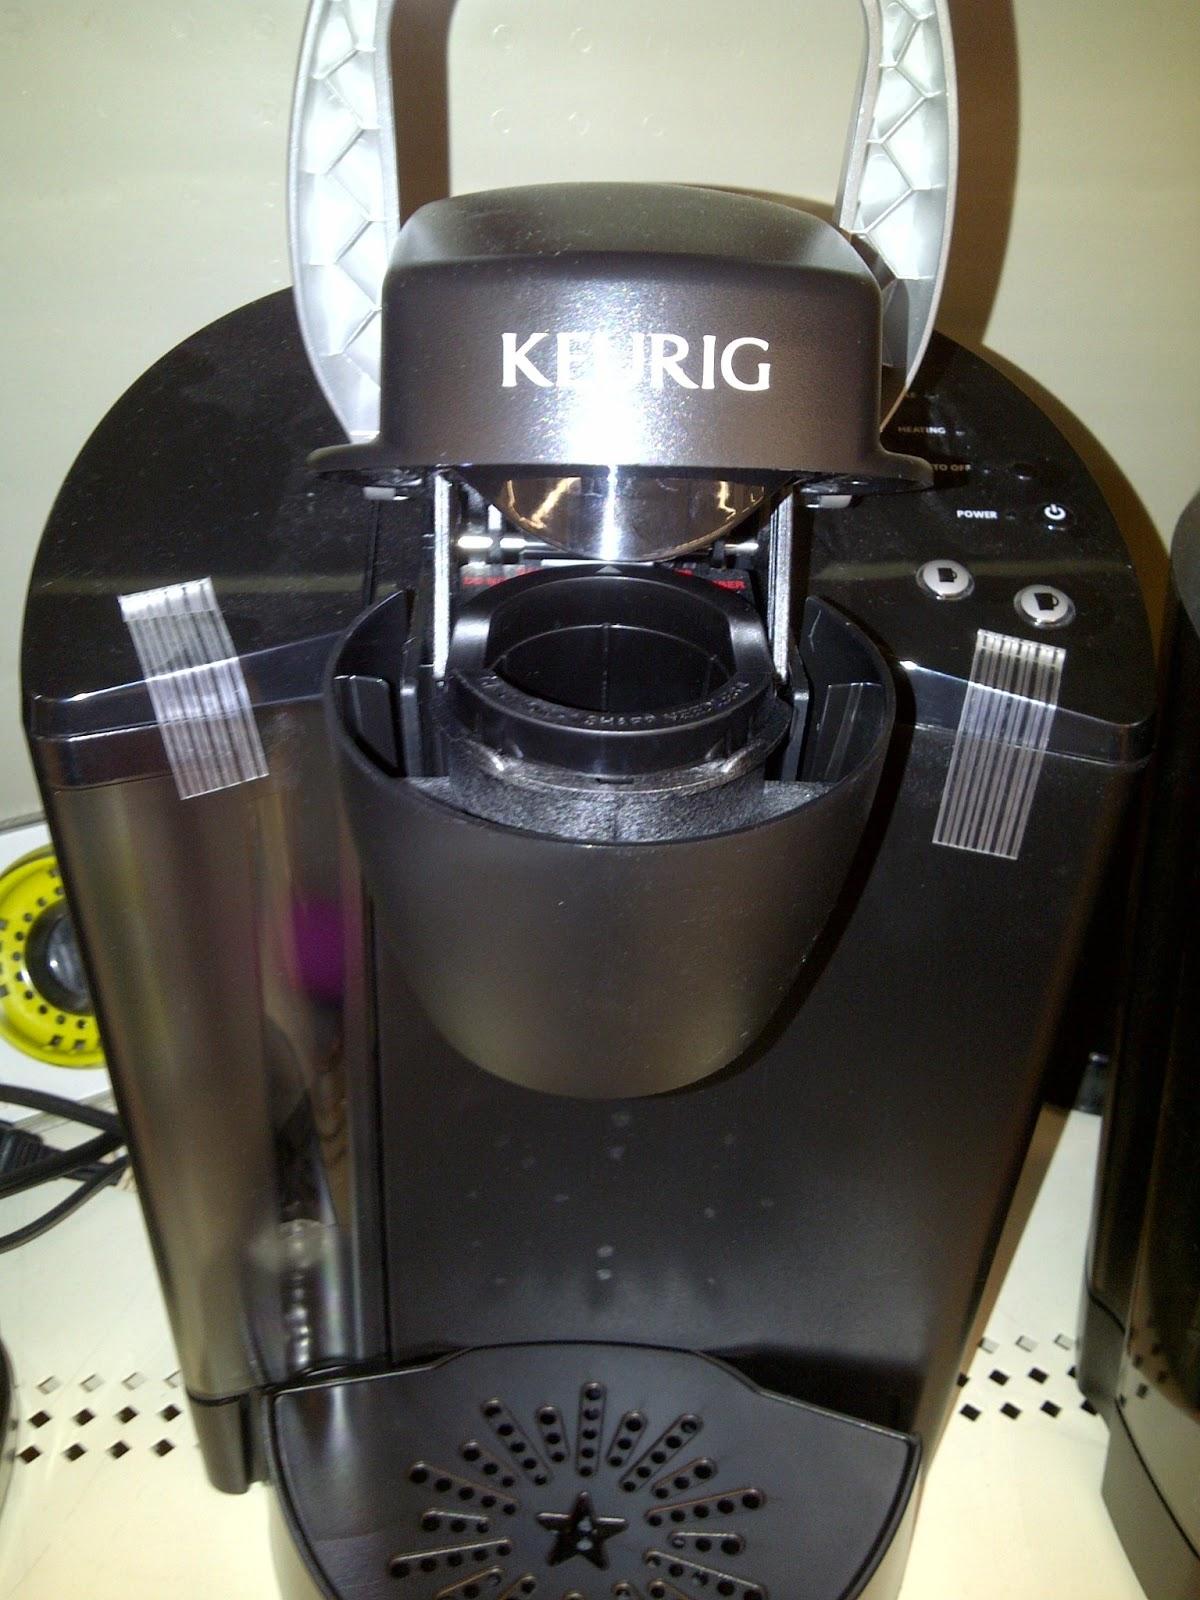 Keurig vs. Starbucks Verismo vs. Senseo Coffee Brewing Systems Coffee Maker Journal